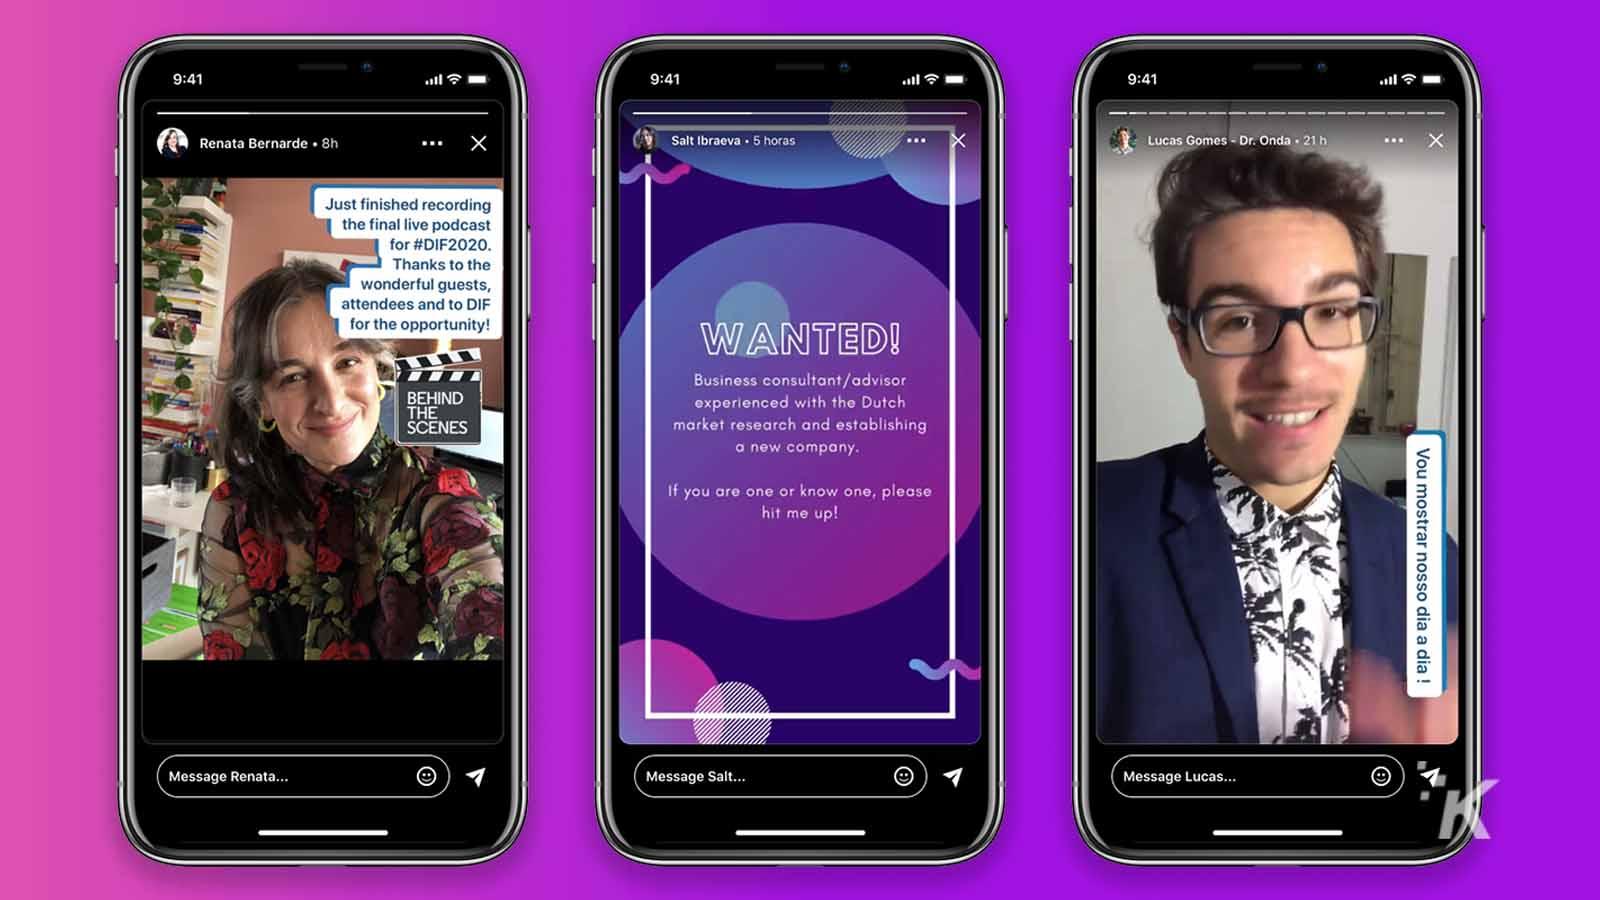 linkedin stories on purple background